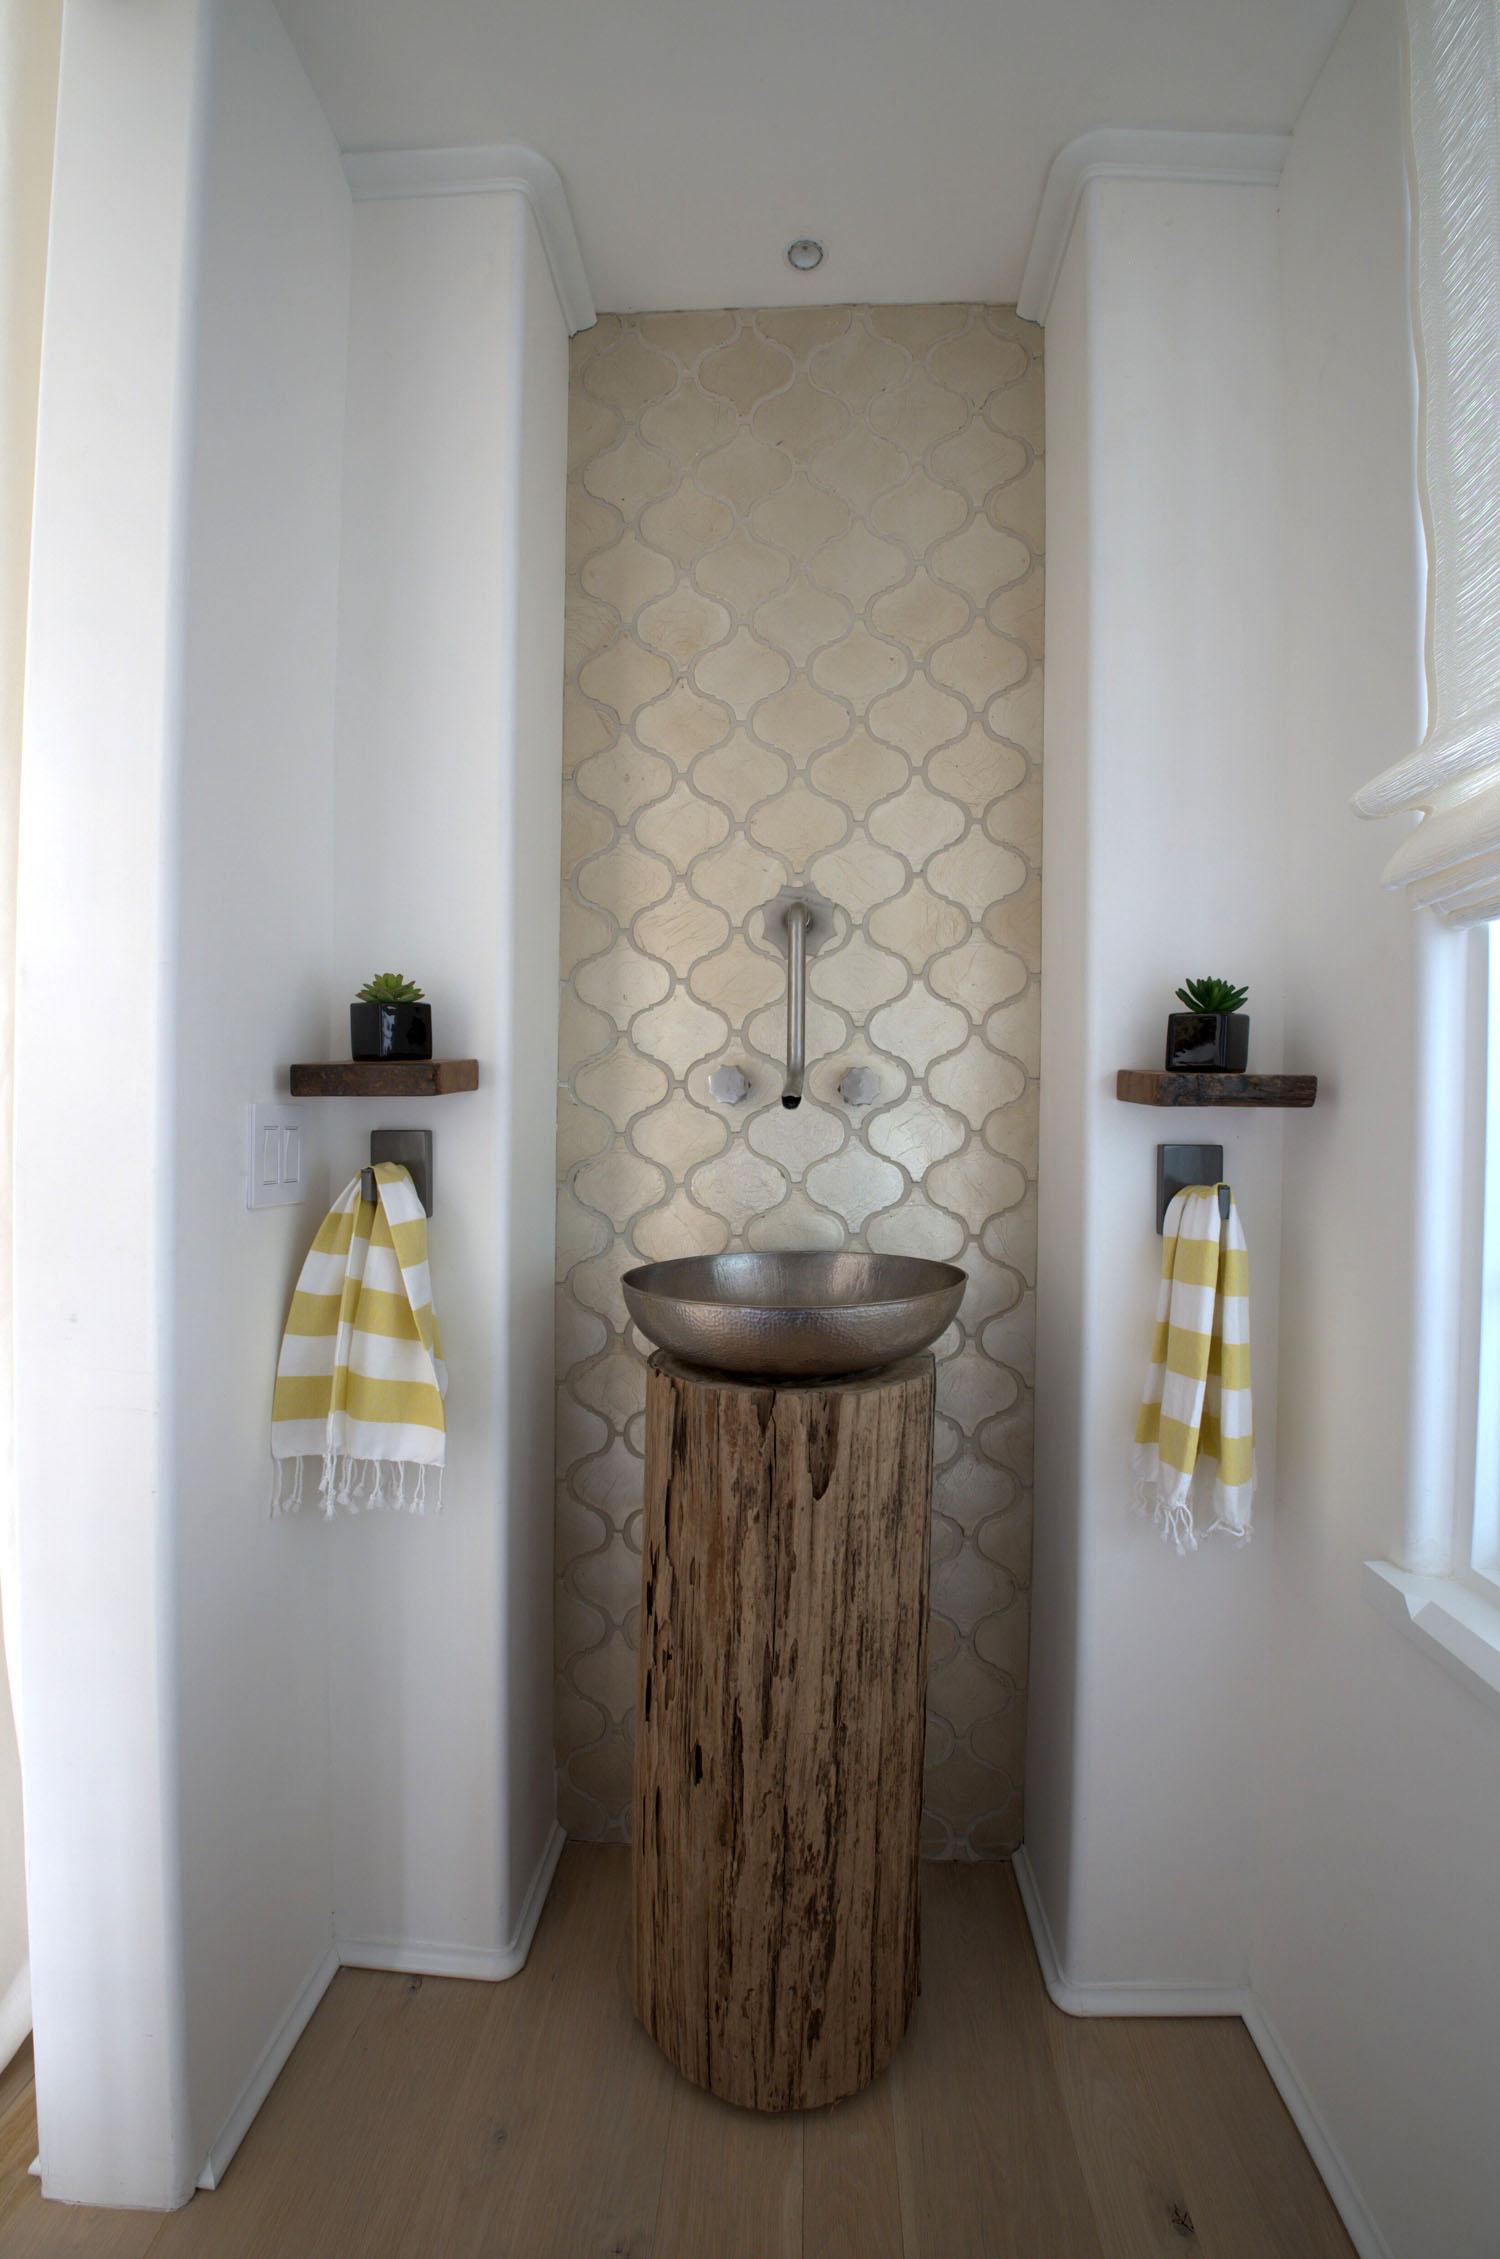 ALYS_BEACH_Bath_sink.jpg